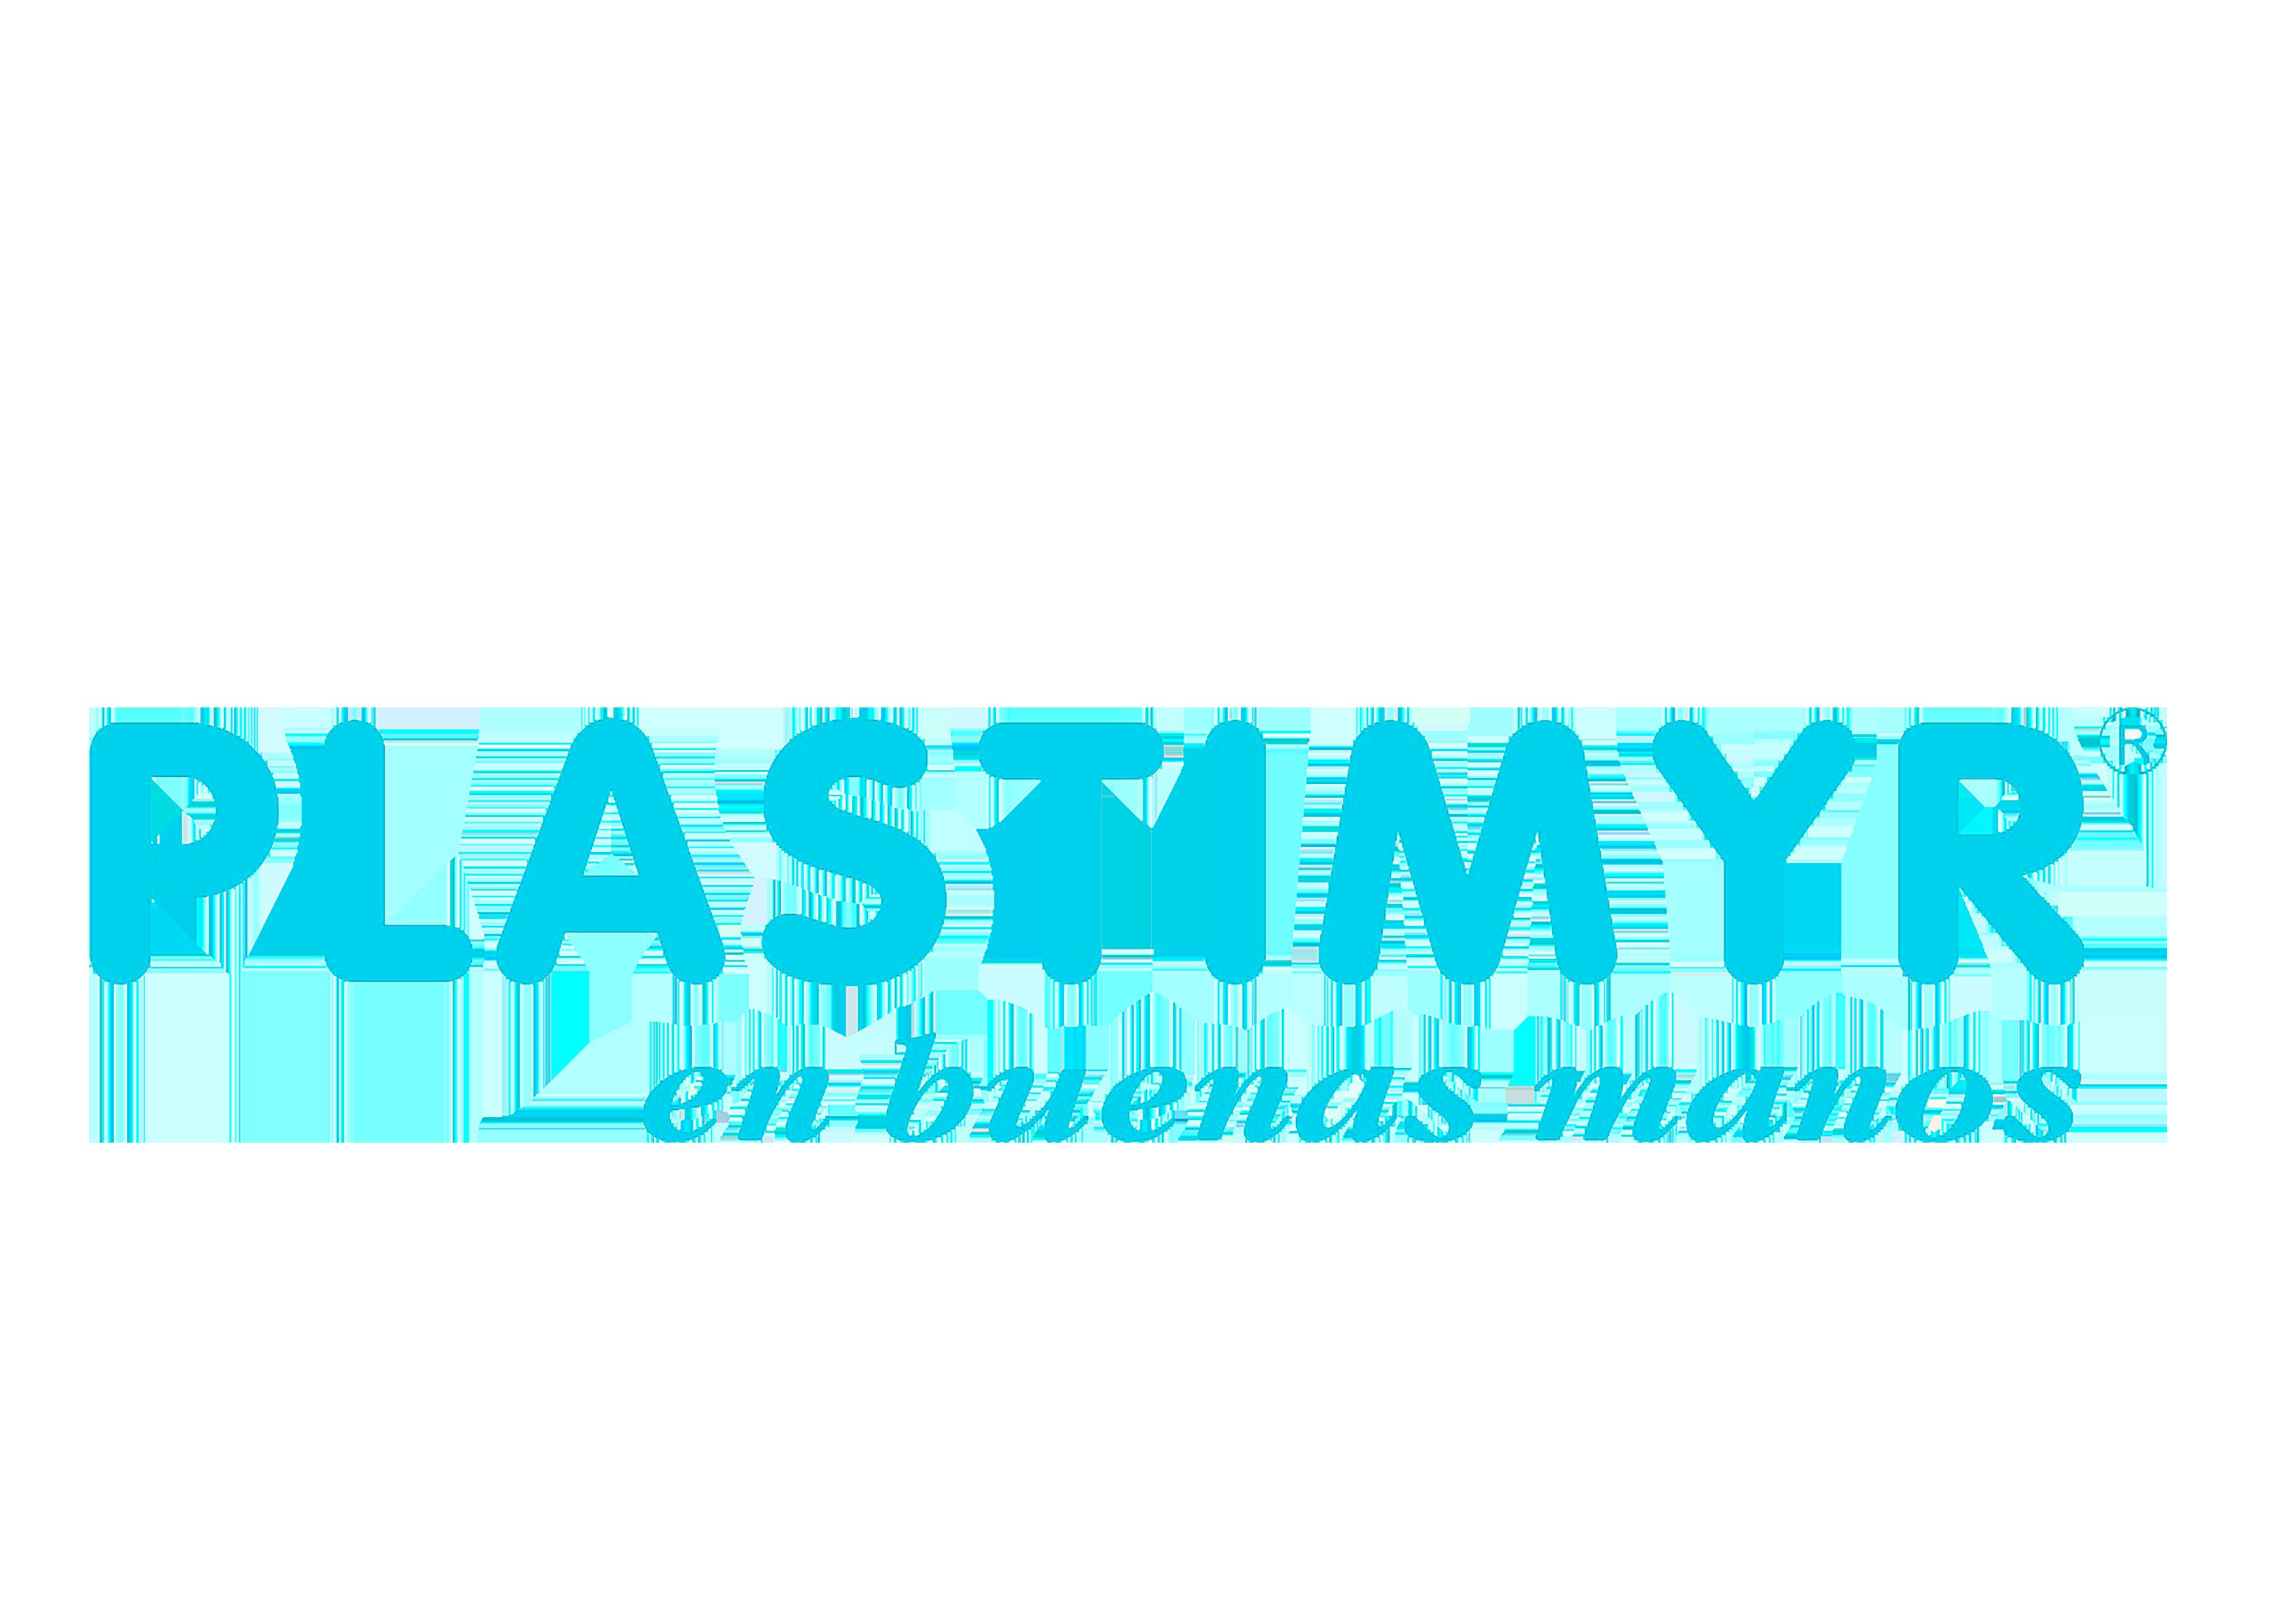 plastimyrrrr